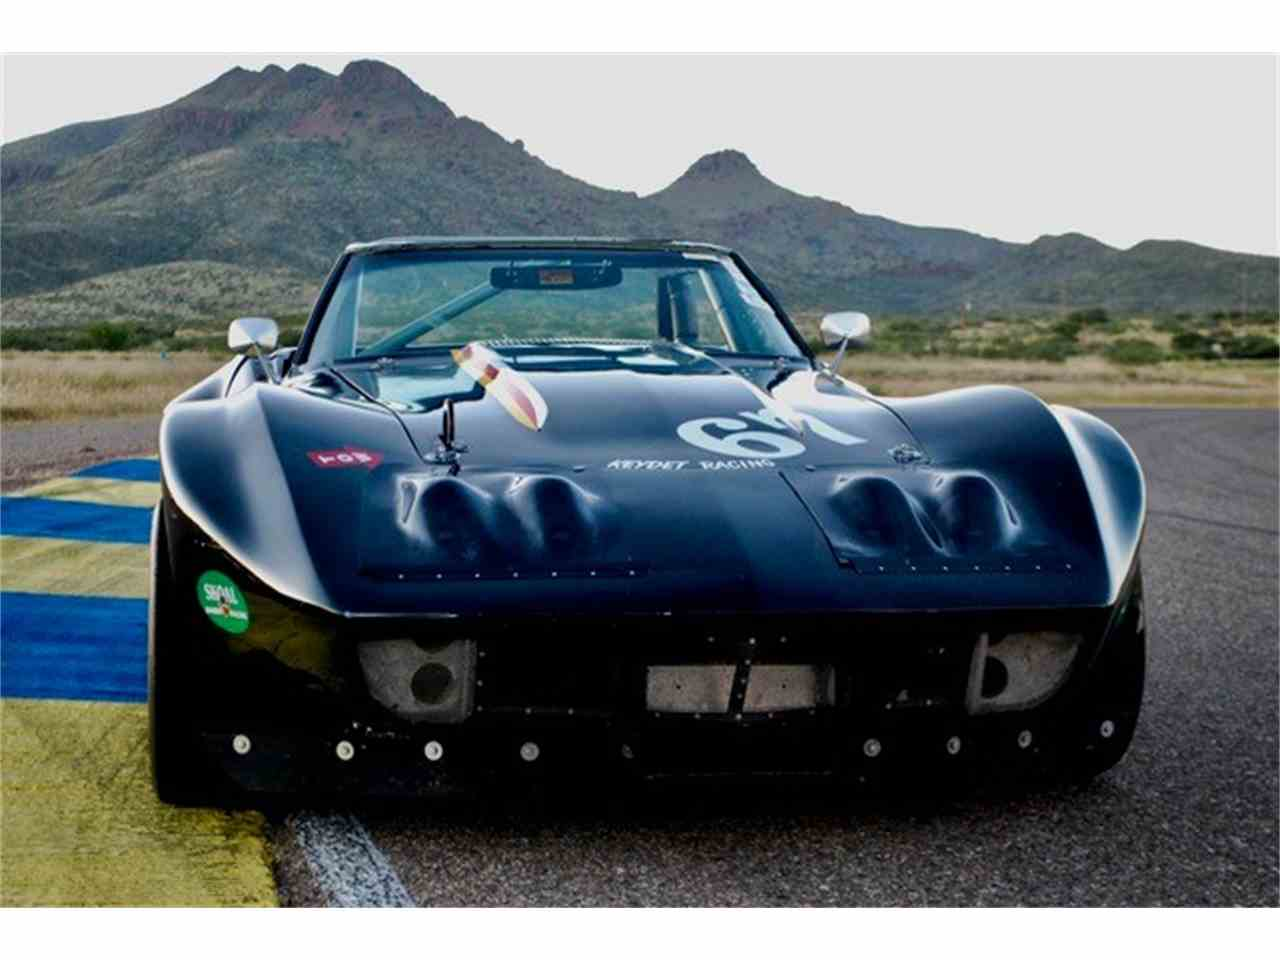 1969 corvette race car for sale cc 1054660. Black Bedroom Furniture Sets. Home Design Ideas